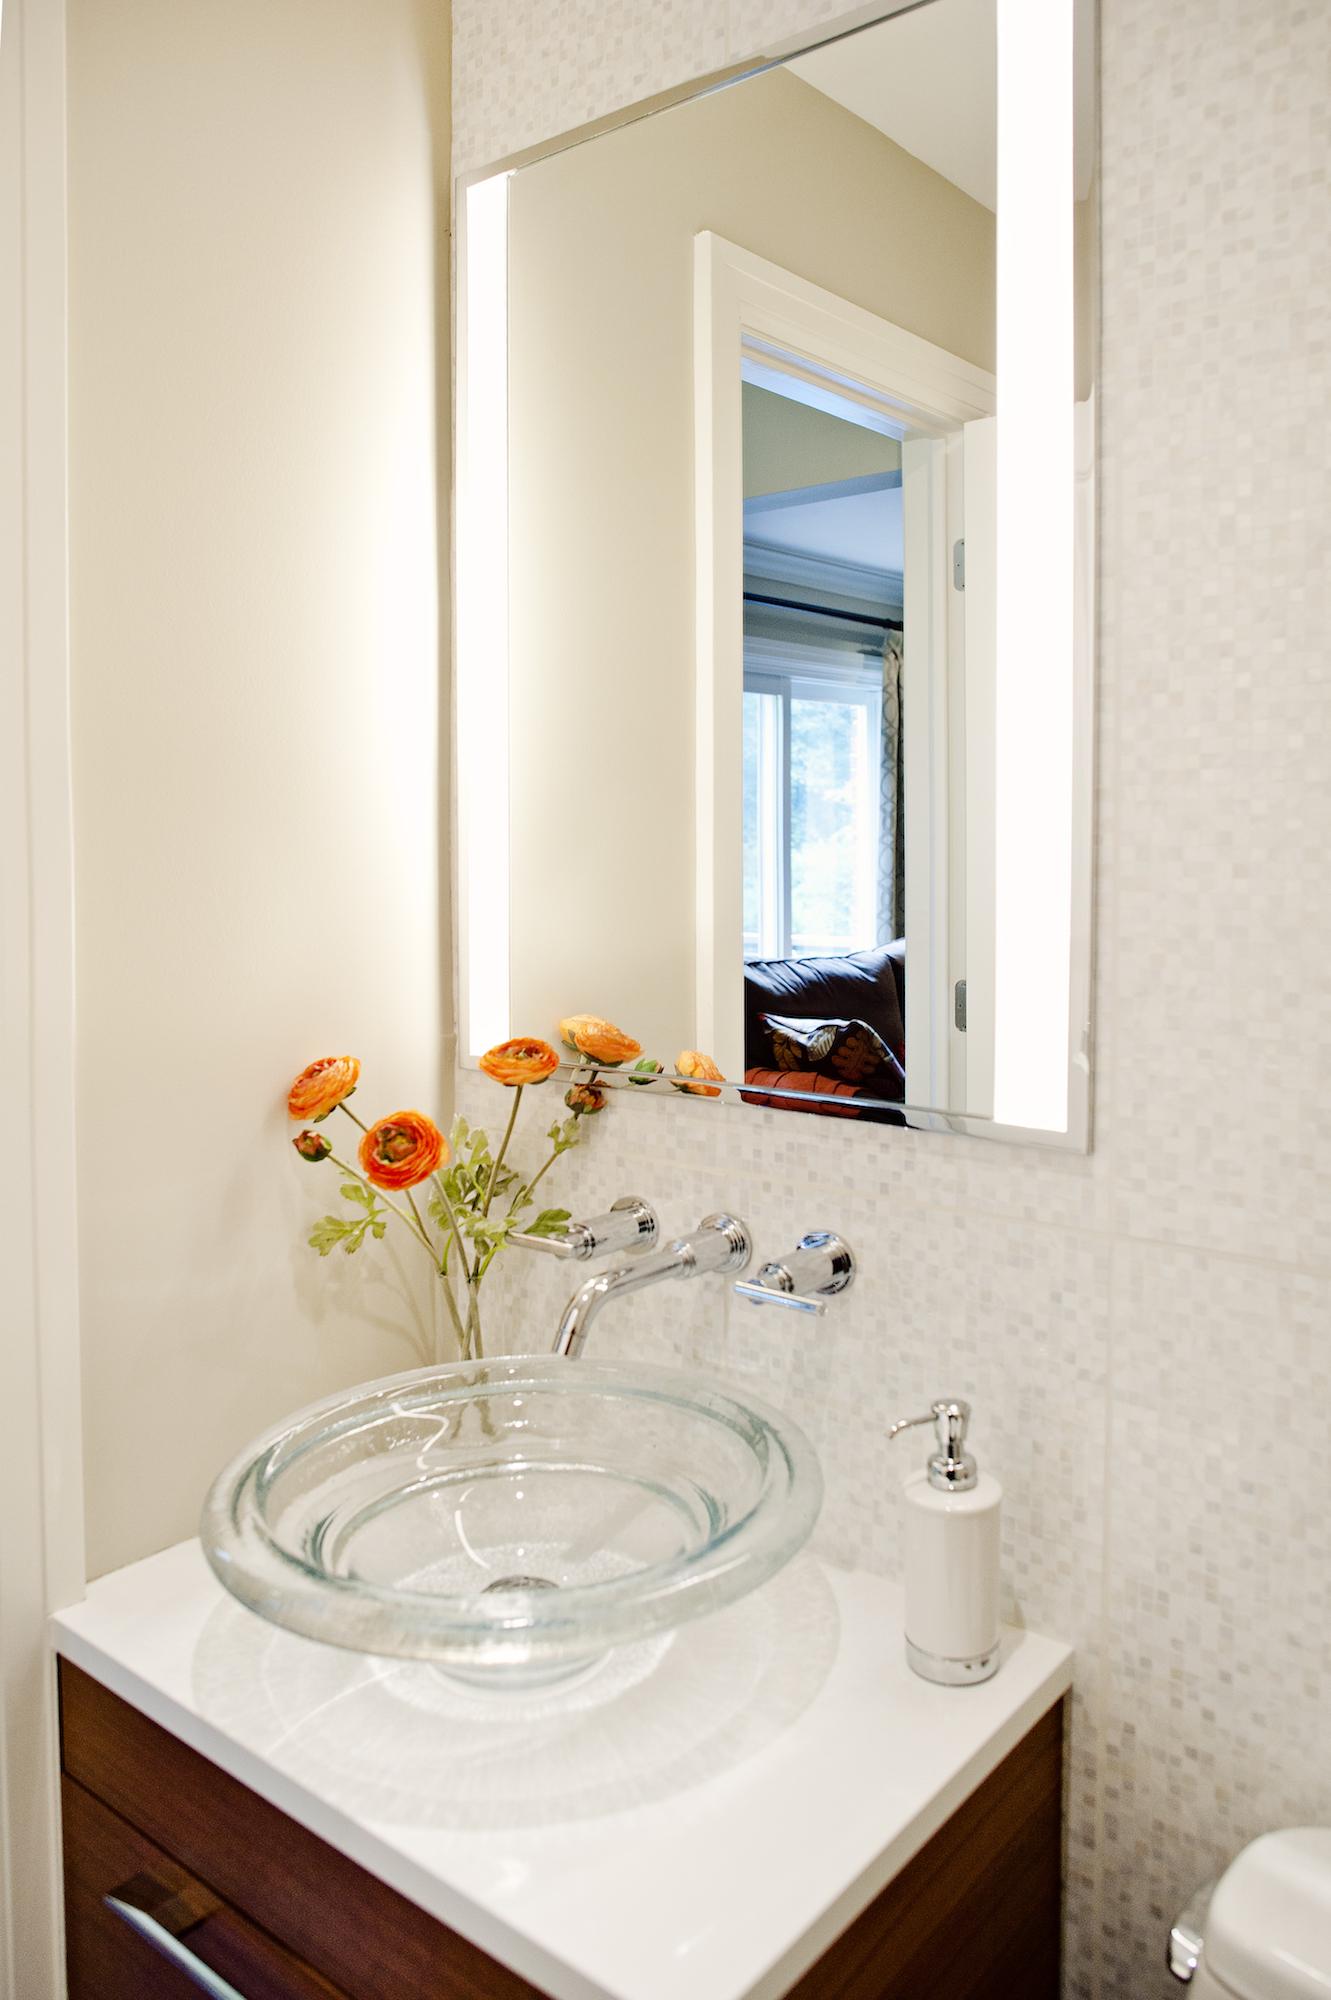 14 Pizzale Design Interior Decorating bathroom Glass bowl sink .jpg